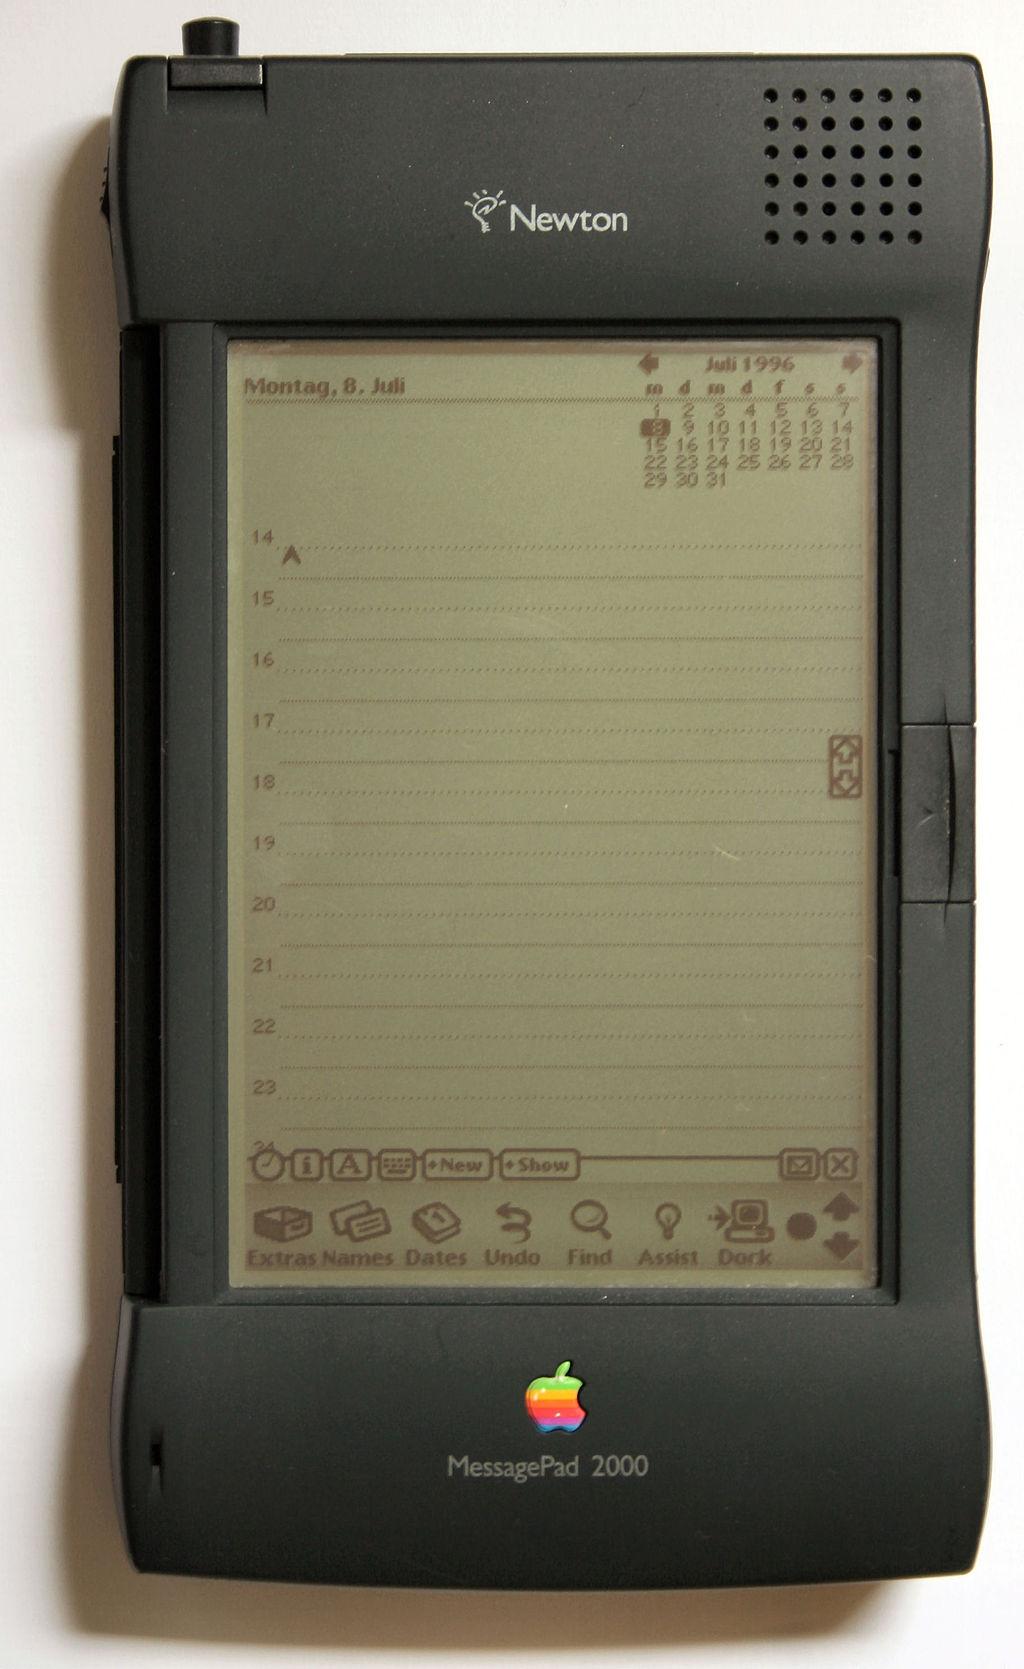 Apple Newton personal digital assistant.